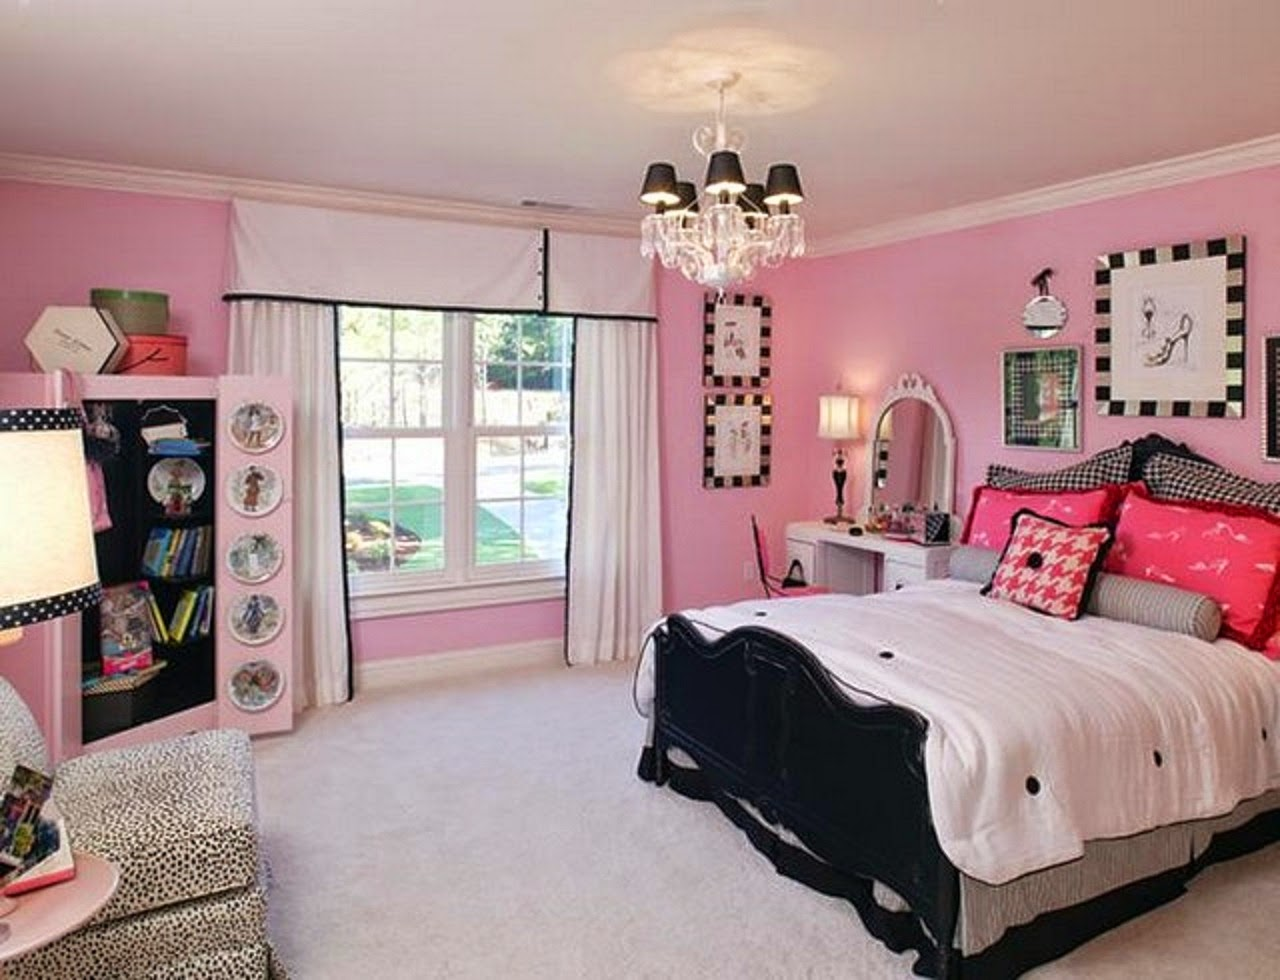 Beautiful Modern Bedroom Designs 2014 2015 Image DownloadDynamic Views  Beautiful Modern Bedroom Designs 2014 2015 Image  . Girl Bedroom Design 2014. Home Design Ideas